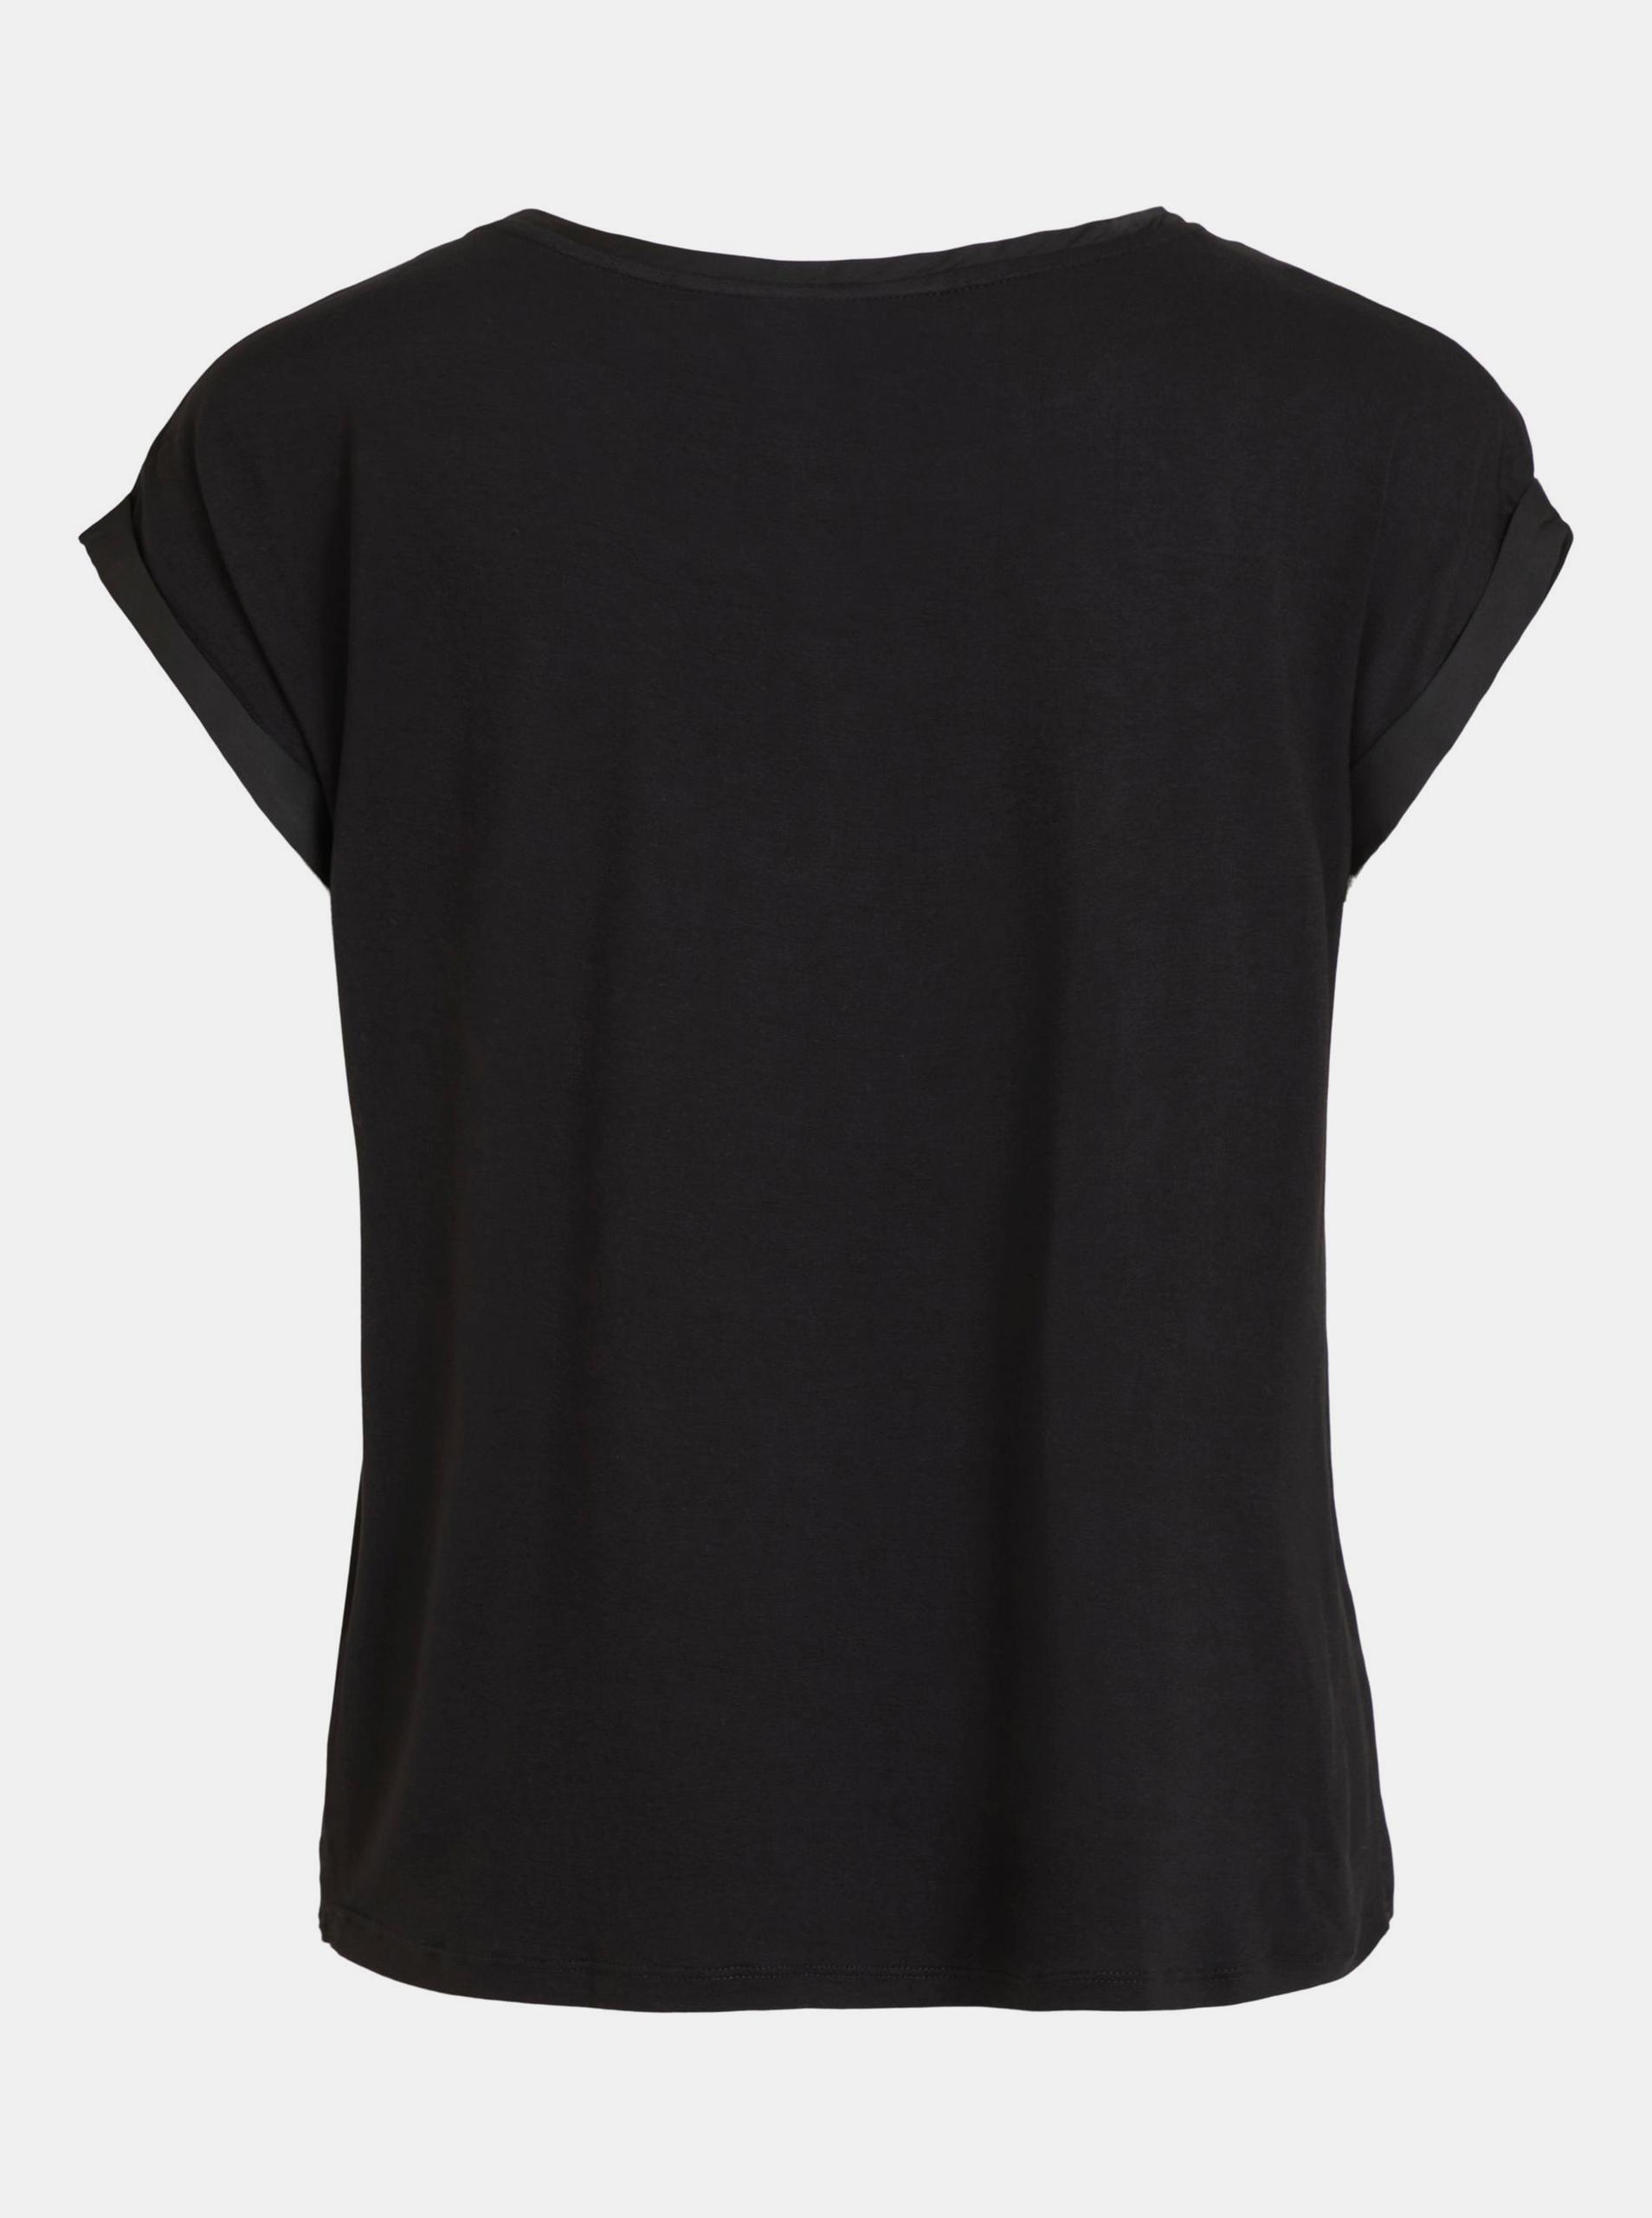 Vila black blouse